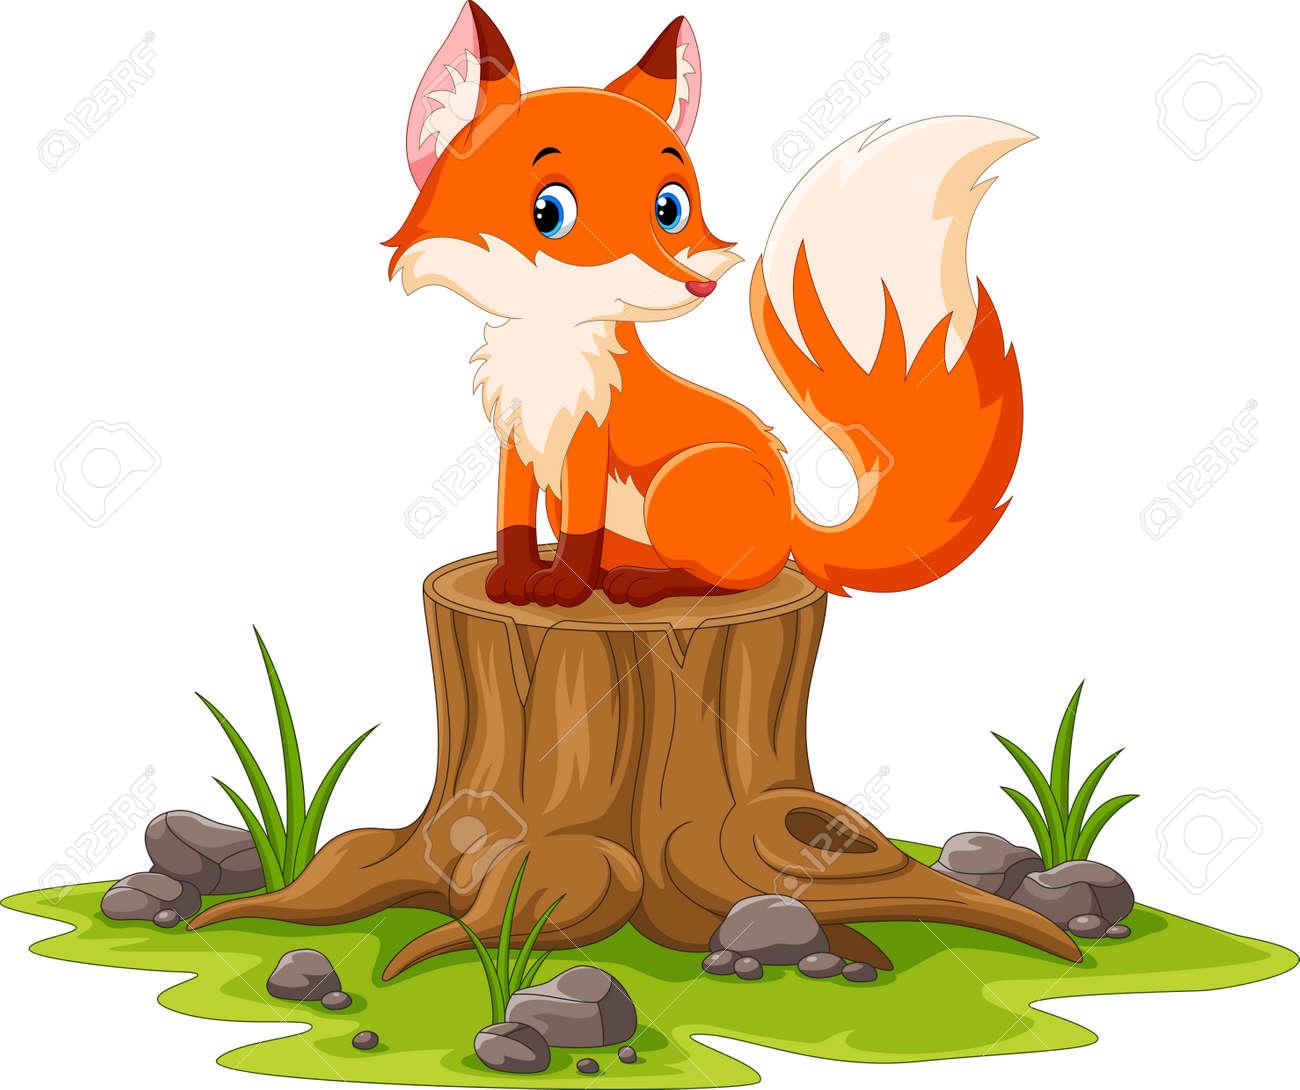 Cartoon happy fox sitting on tree stump - 165272328